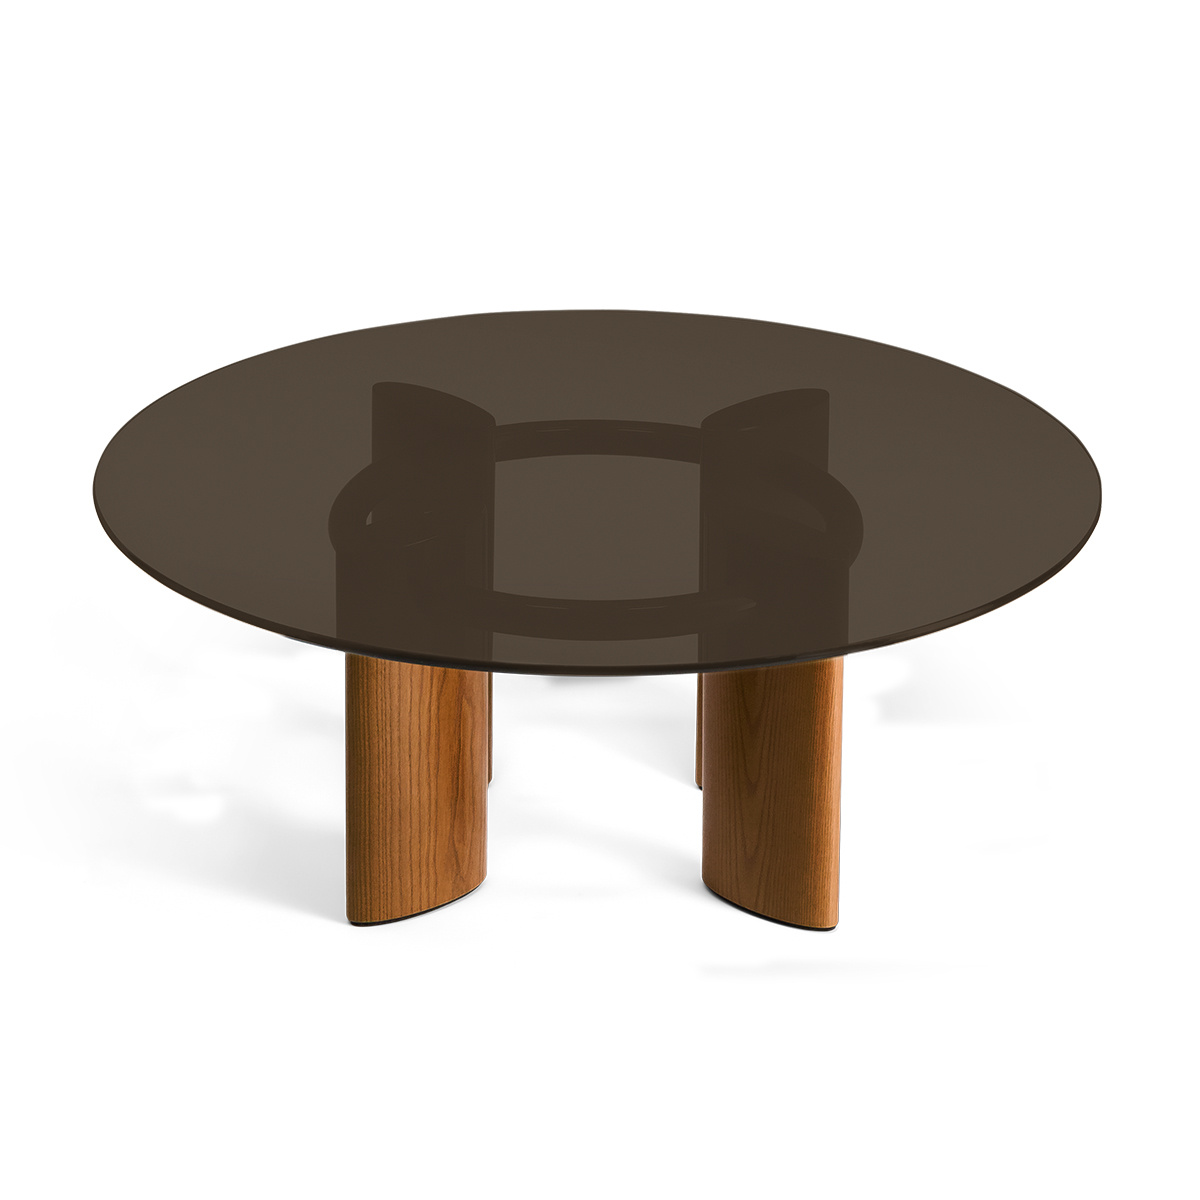 Carlotta Coffee Table, Smoked Glass Top and Ash Wood with Iroko Finsh Legs